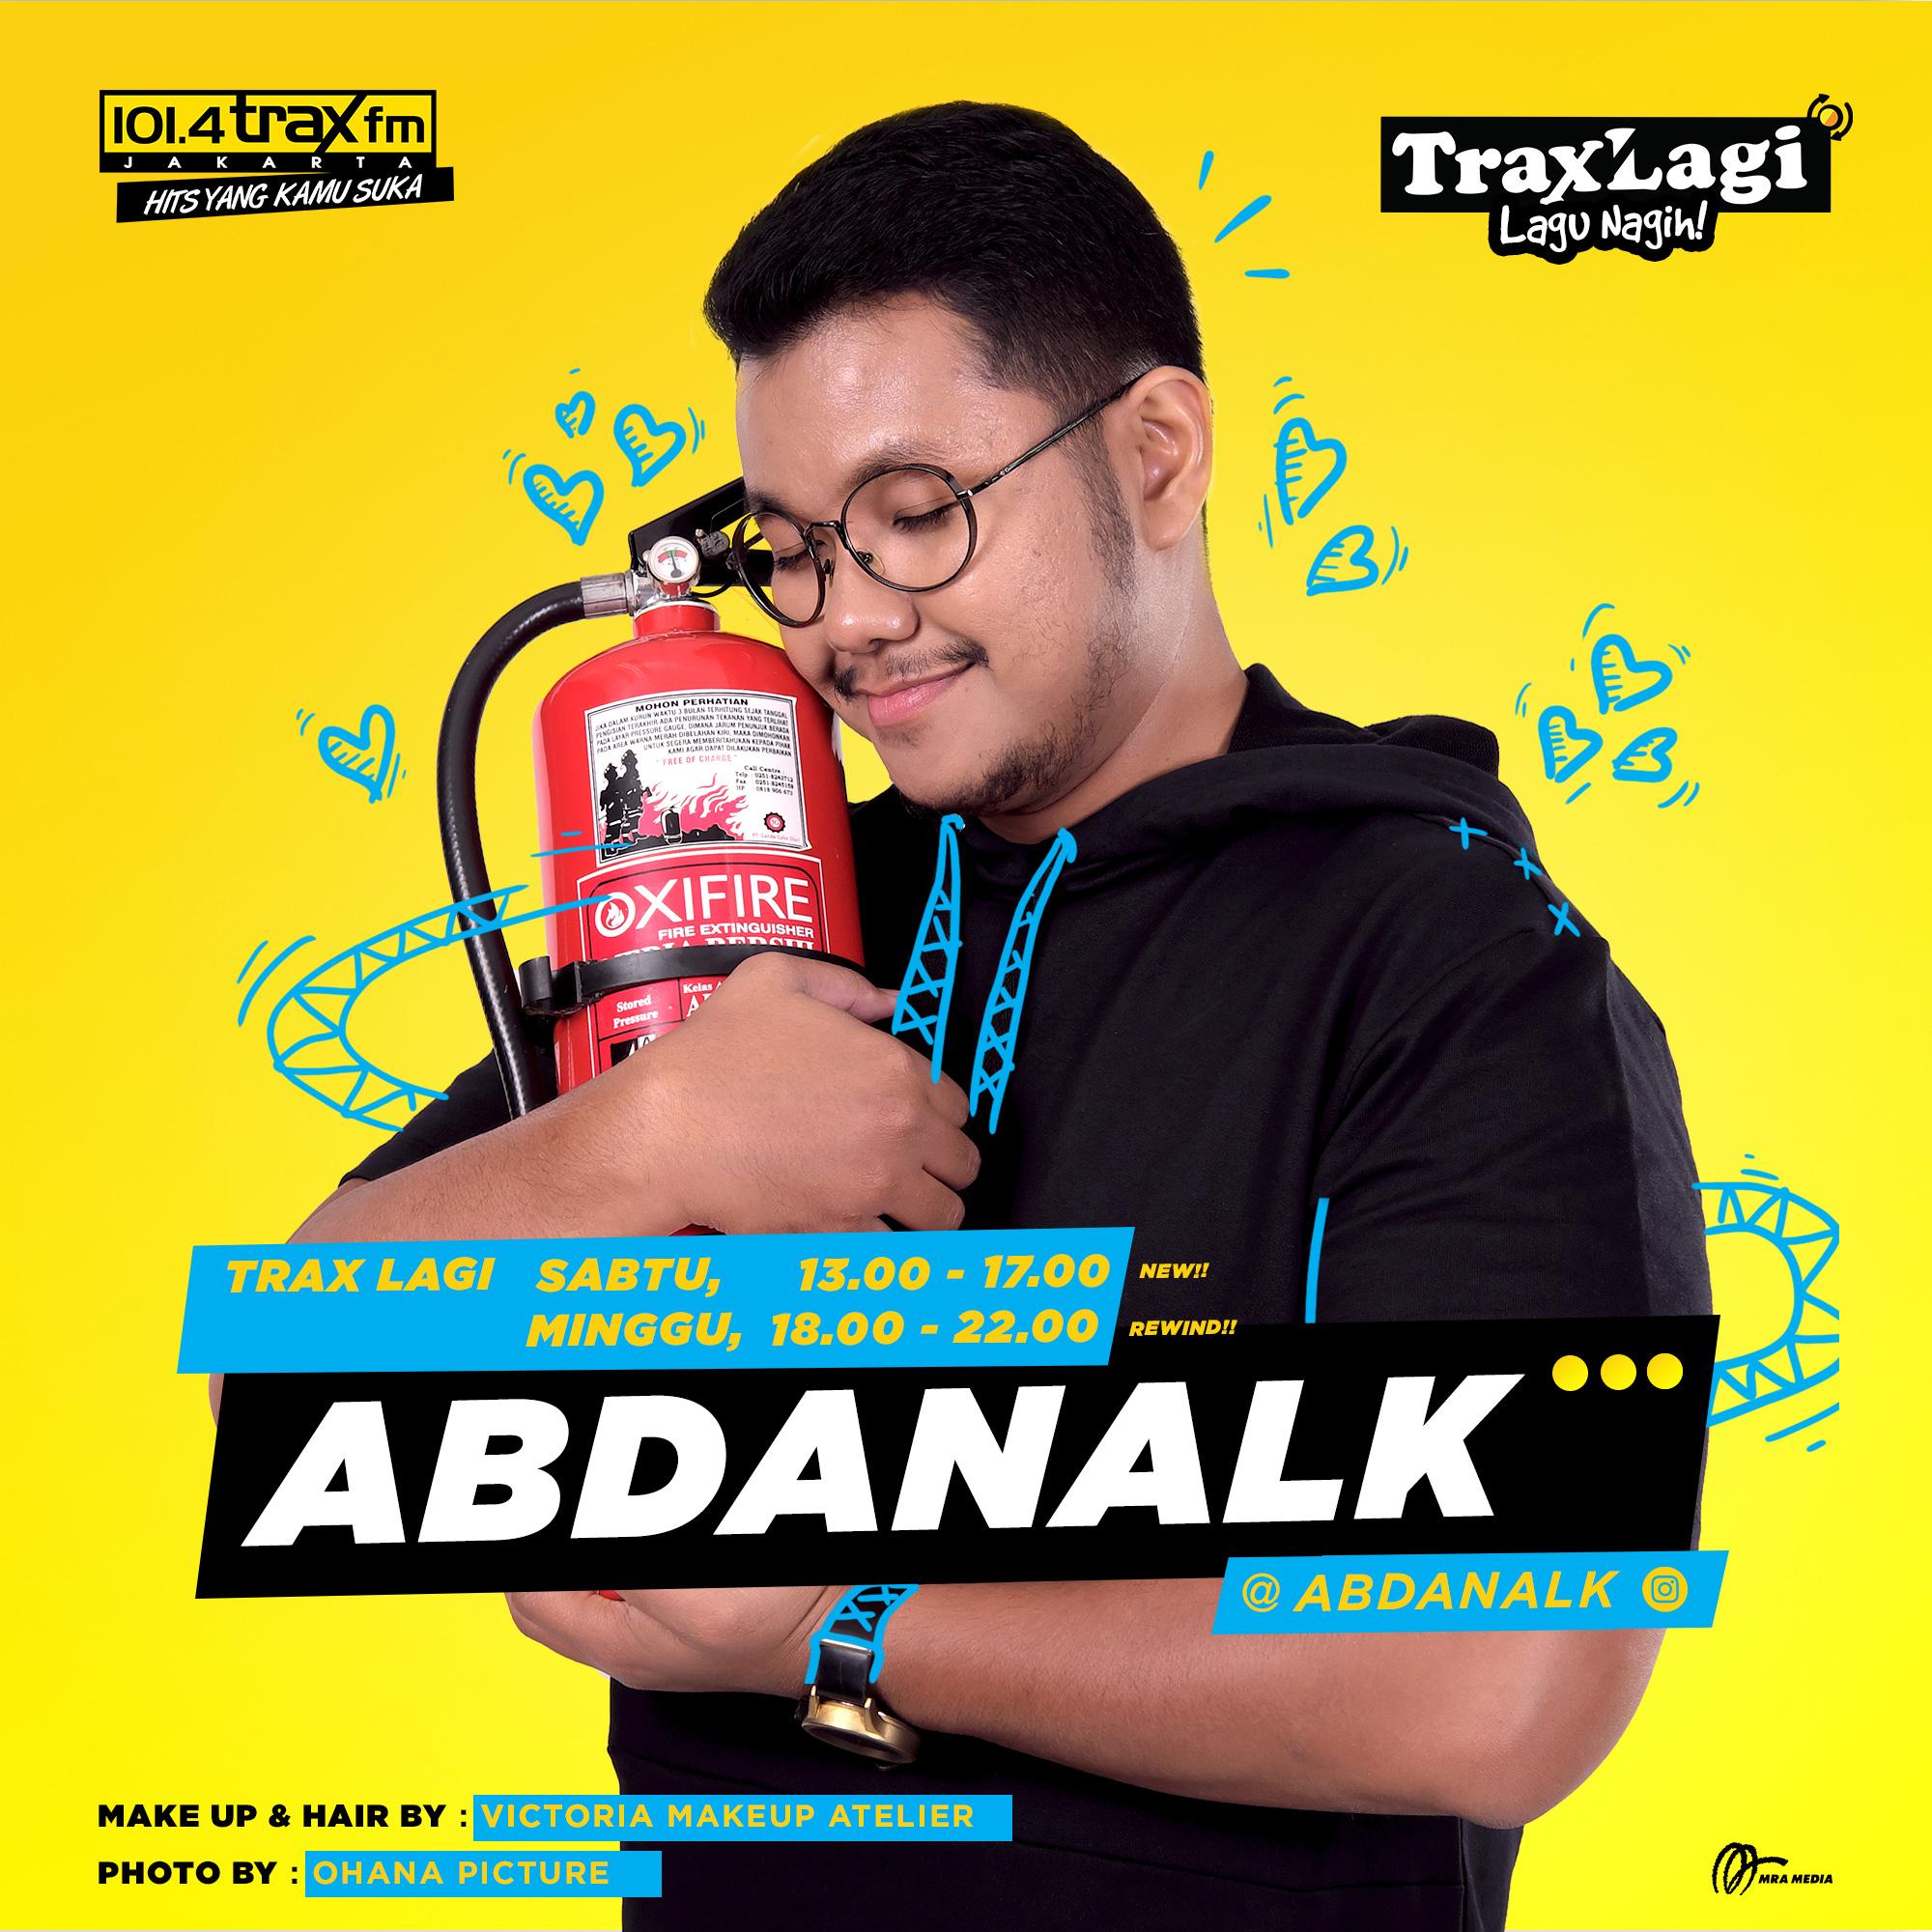 Abdanalk